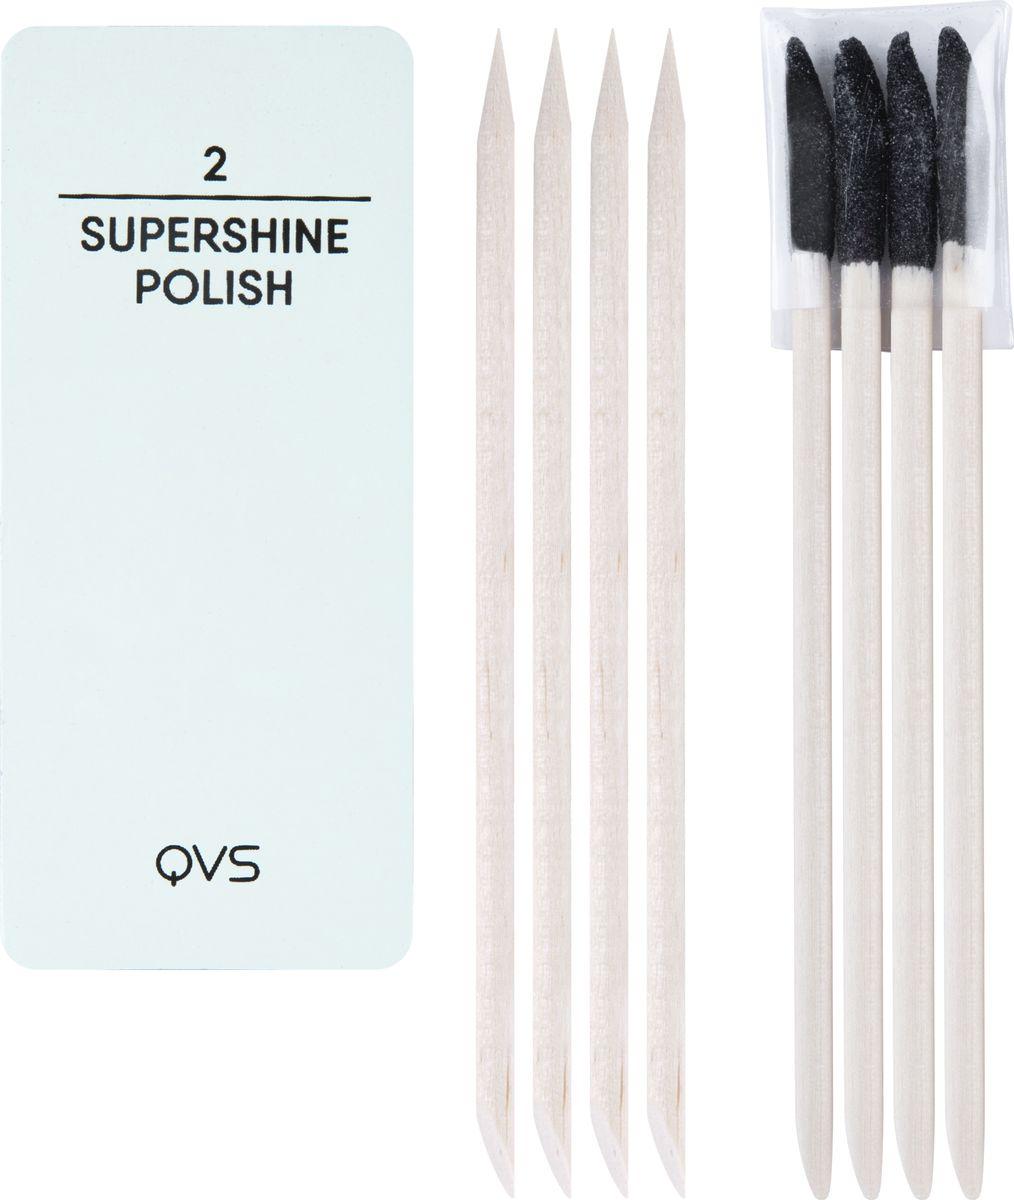 все цены на QVS Набор для ухода за ногтями и кутикулой (мини-баф/полировка, палочки для кутикулы). 82-10-1679 онлайн